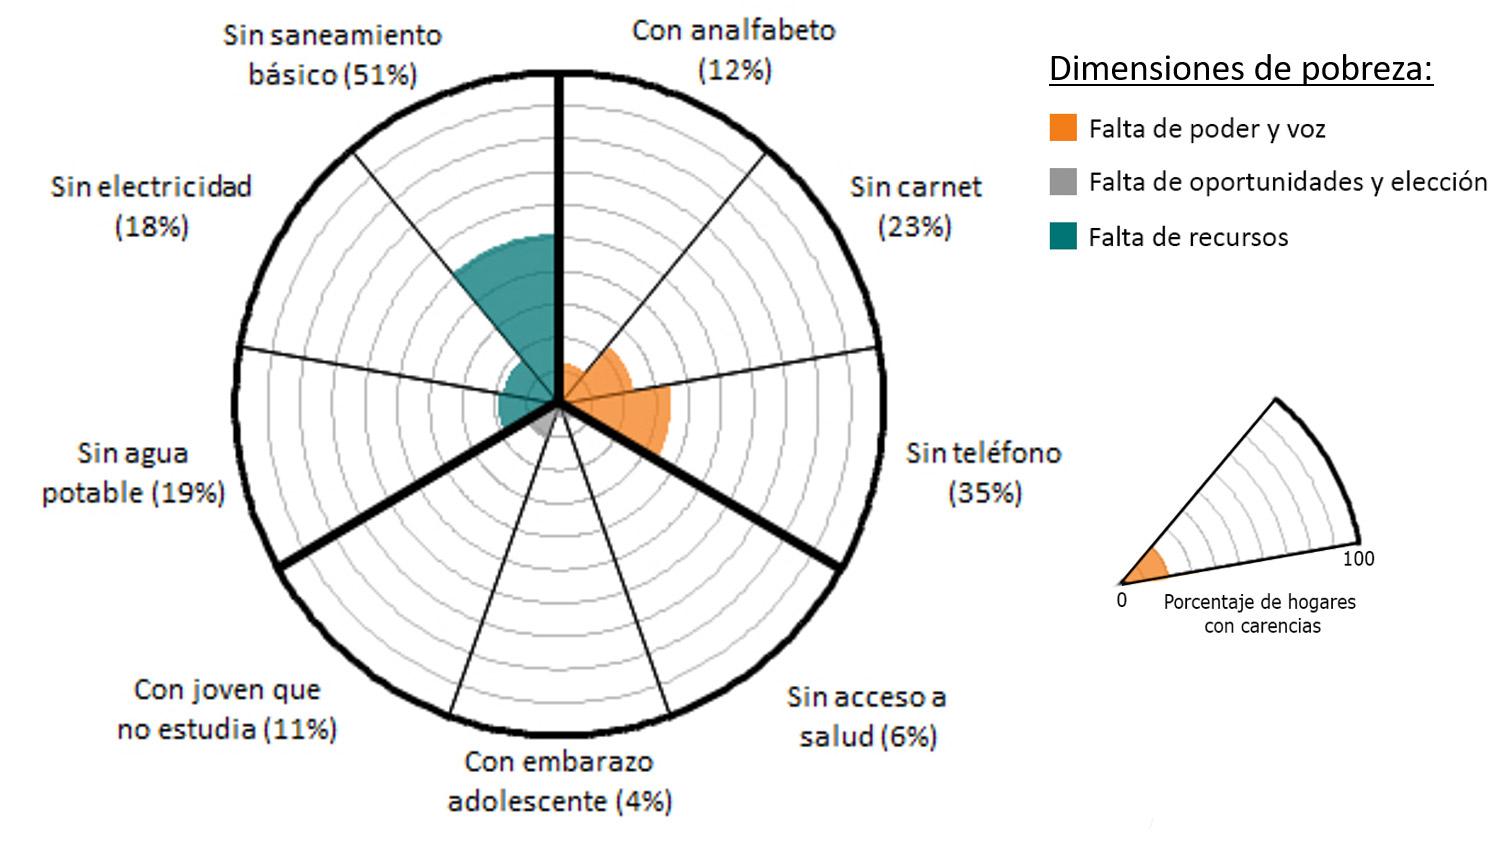 DimensionsOfPoverty